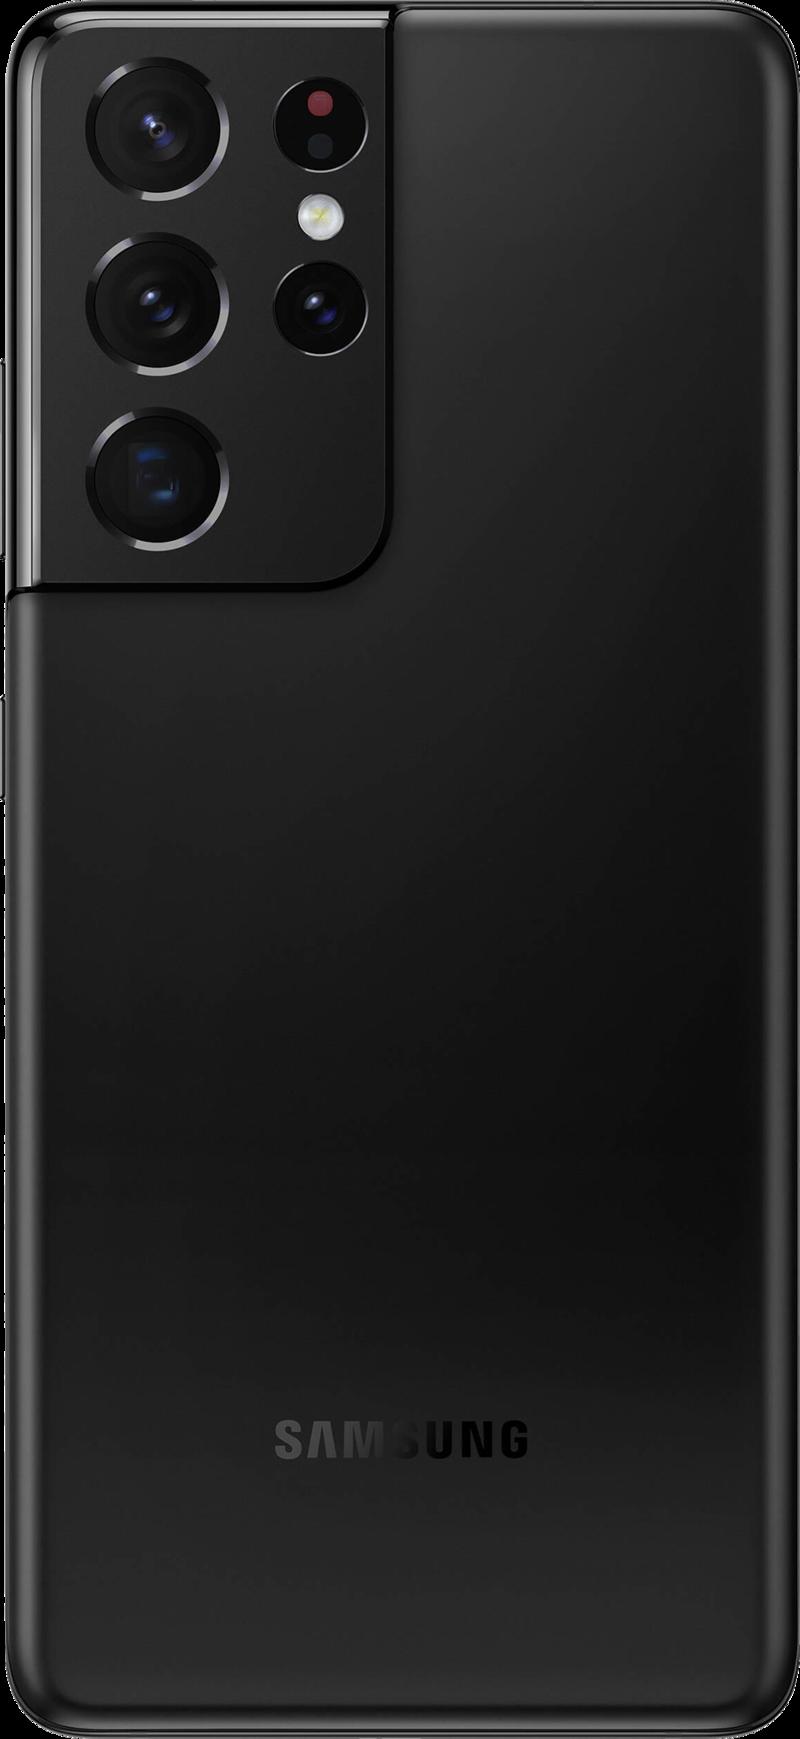 galaxy-s21-ultra-render-phantom-black-of